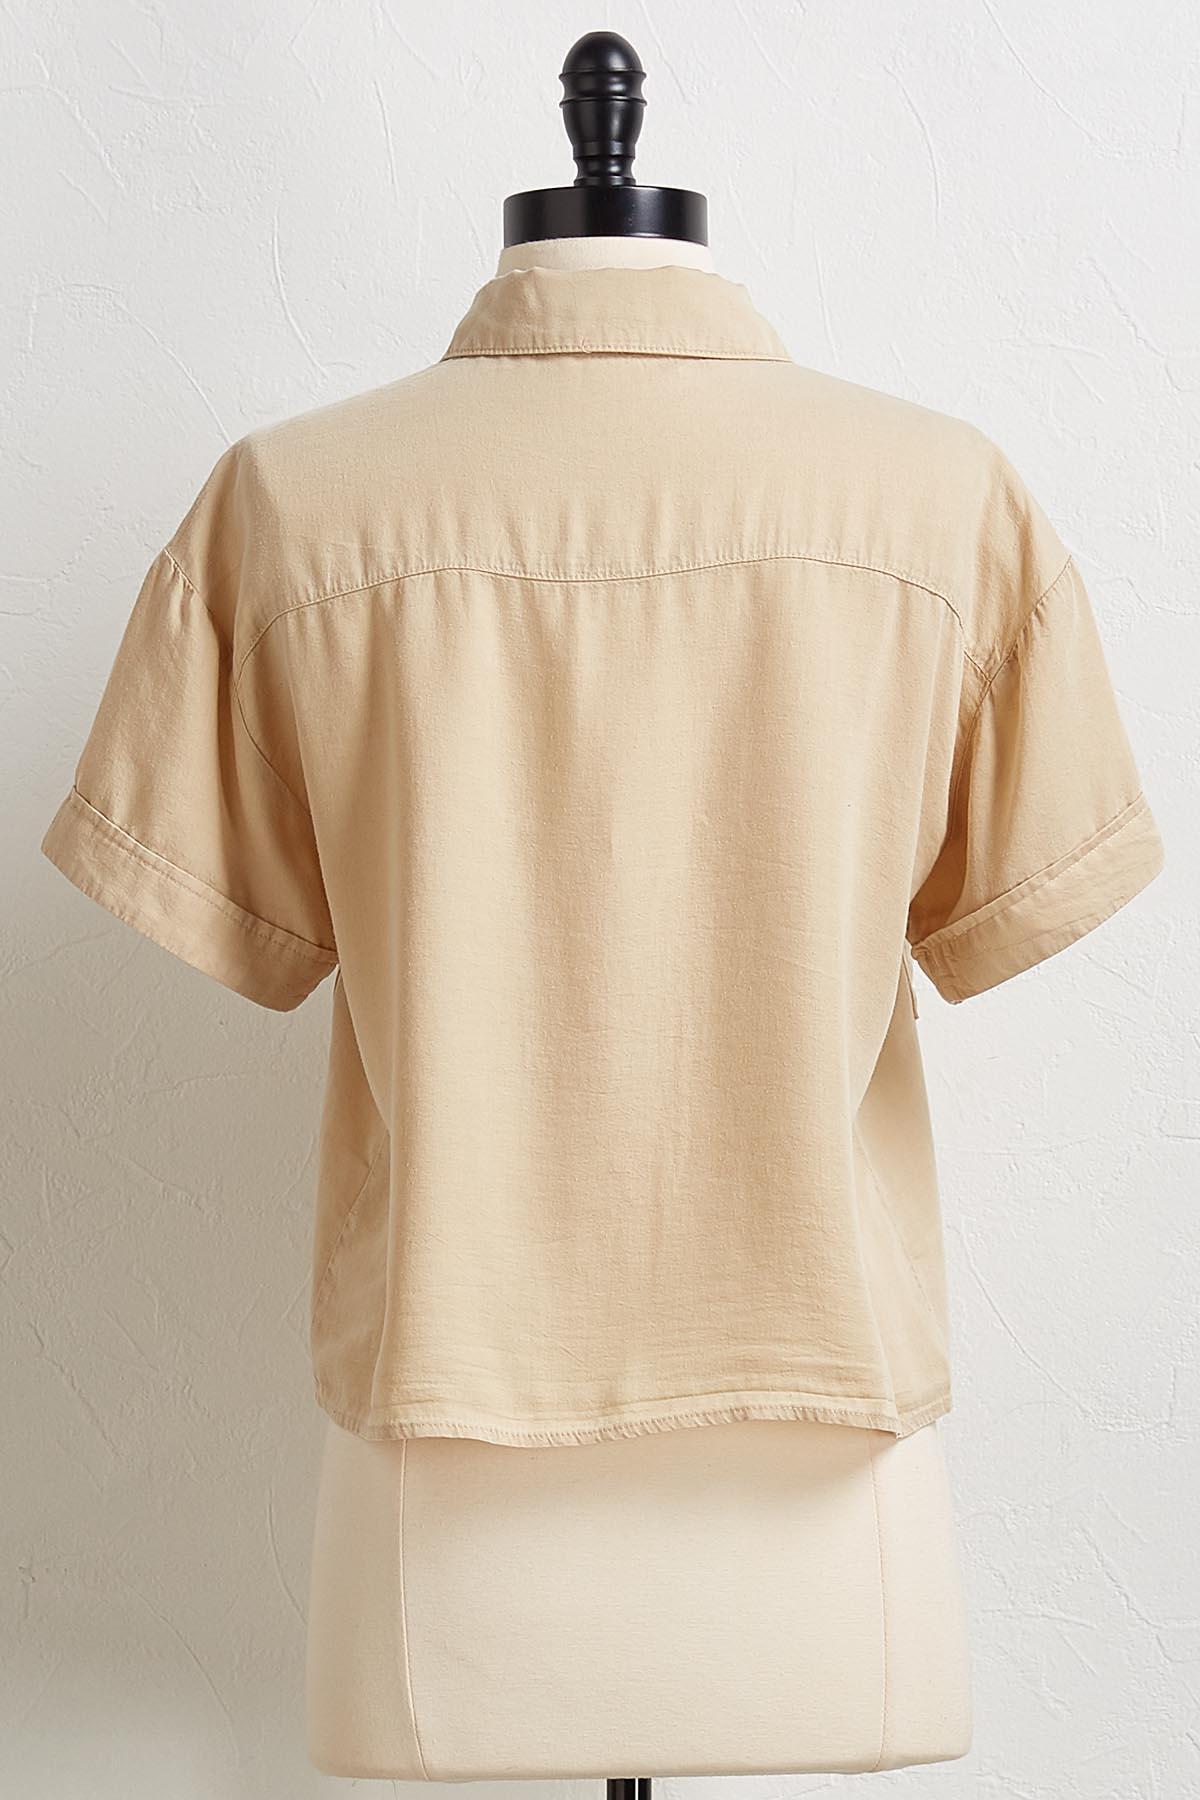 Cropped Utility Shirt